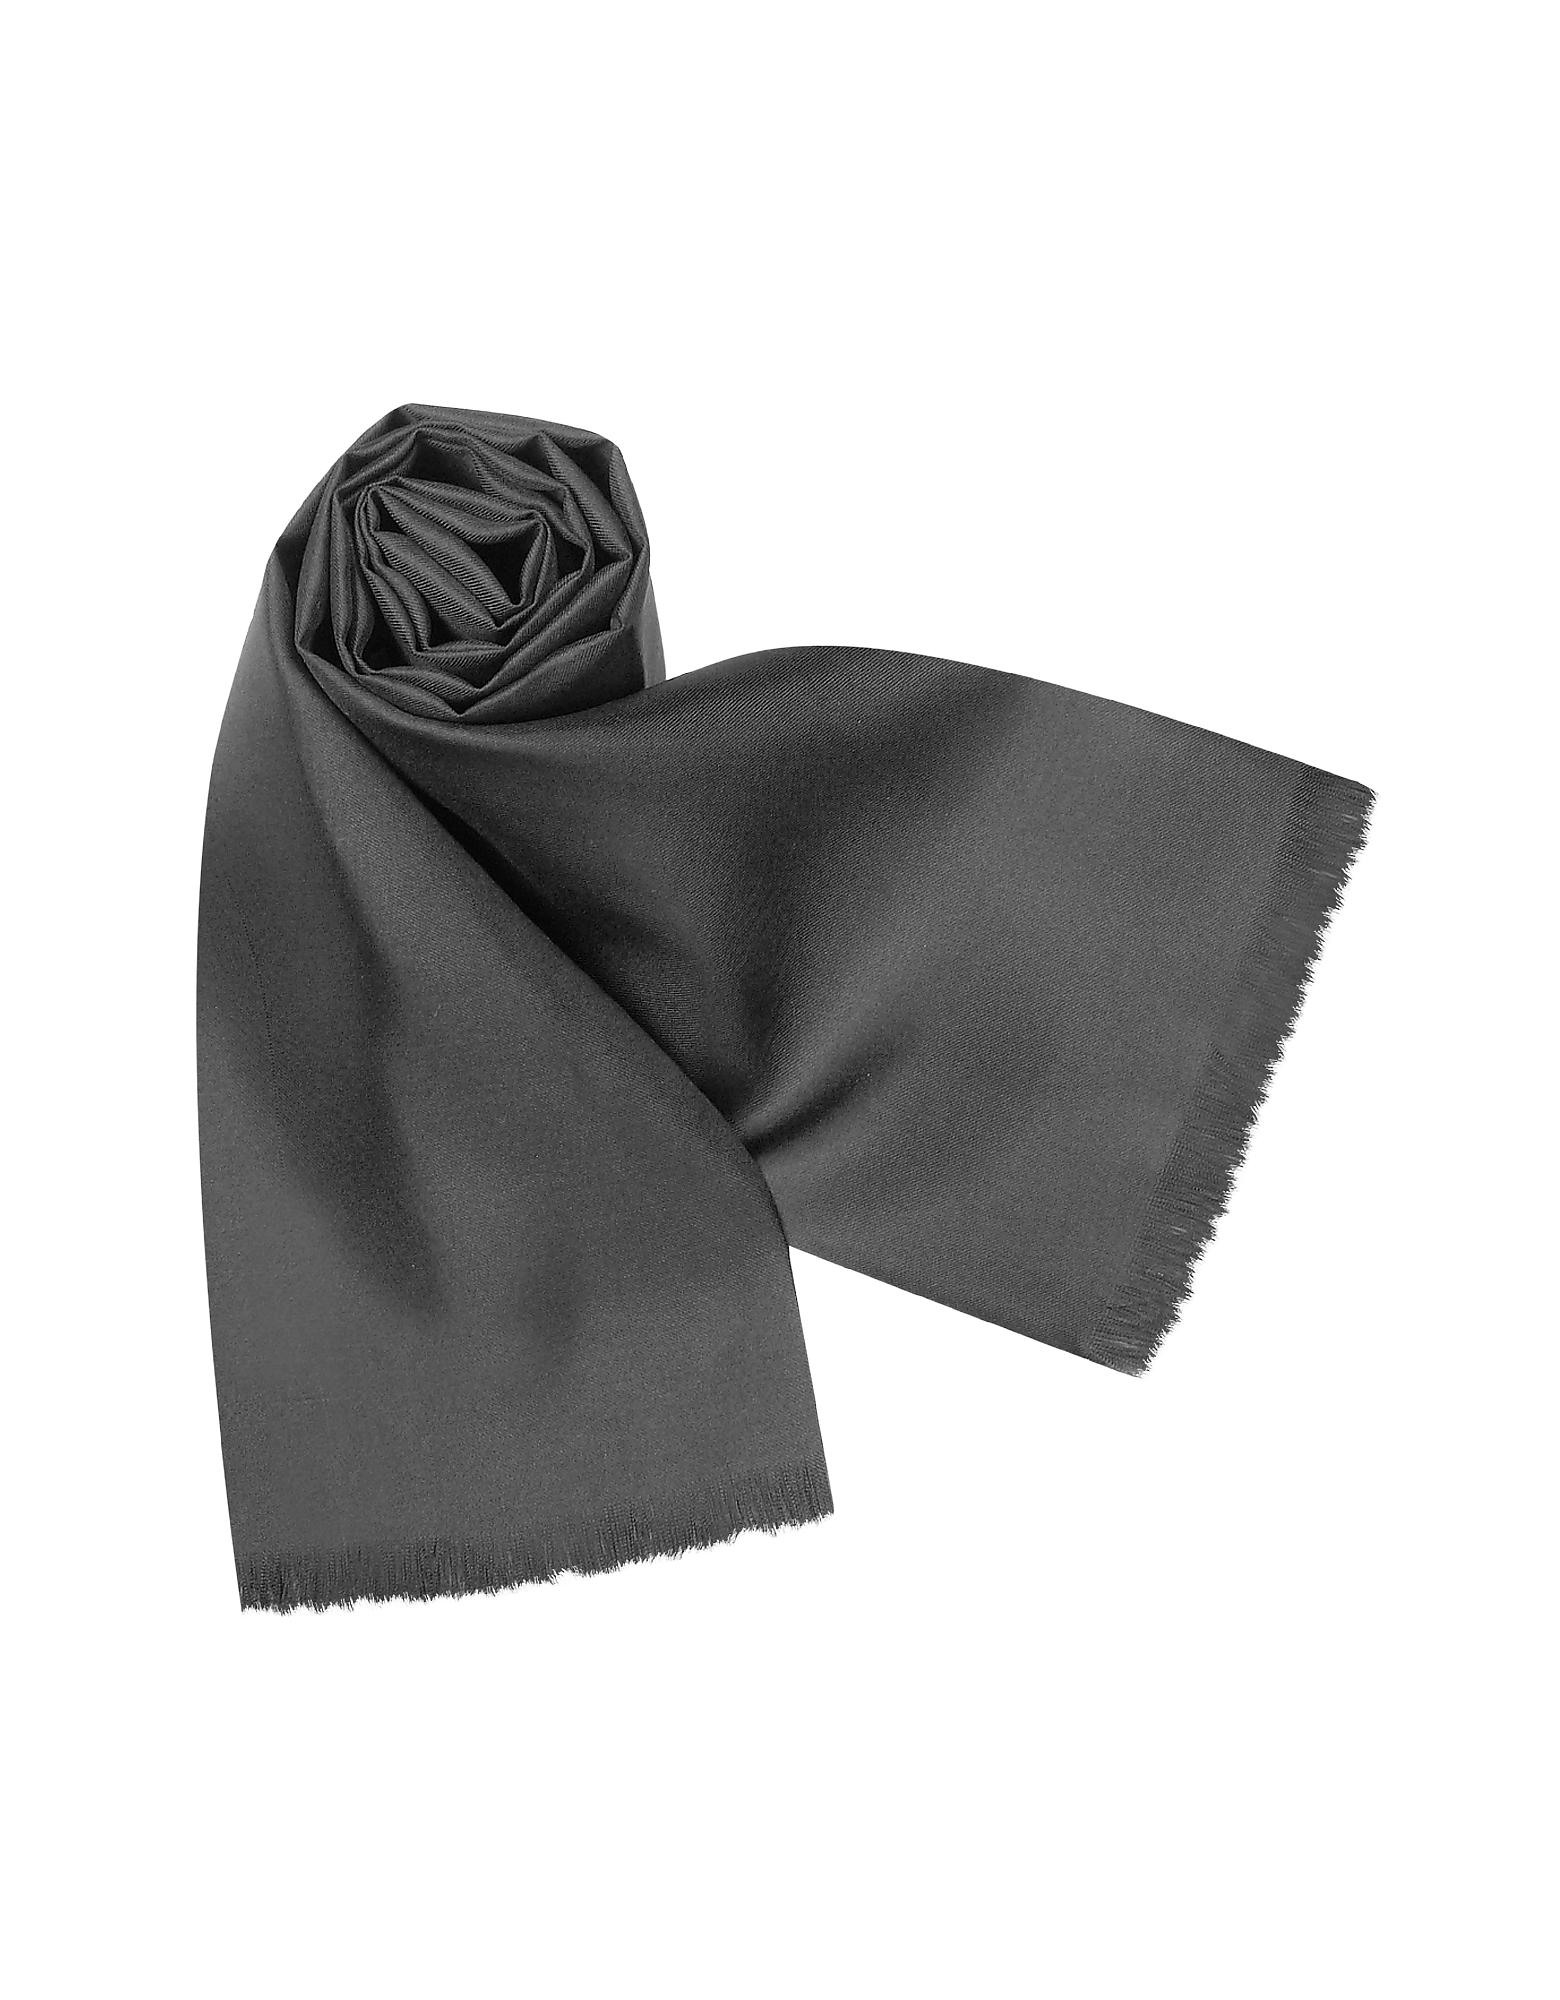 Forzieri Men's Scarves, Solid Silk Scarf